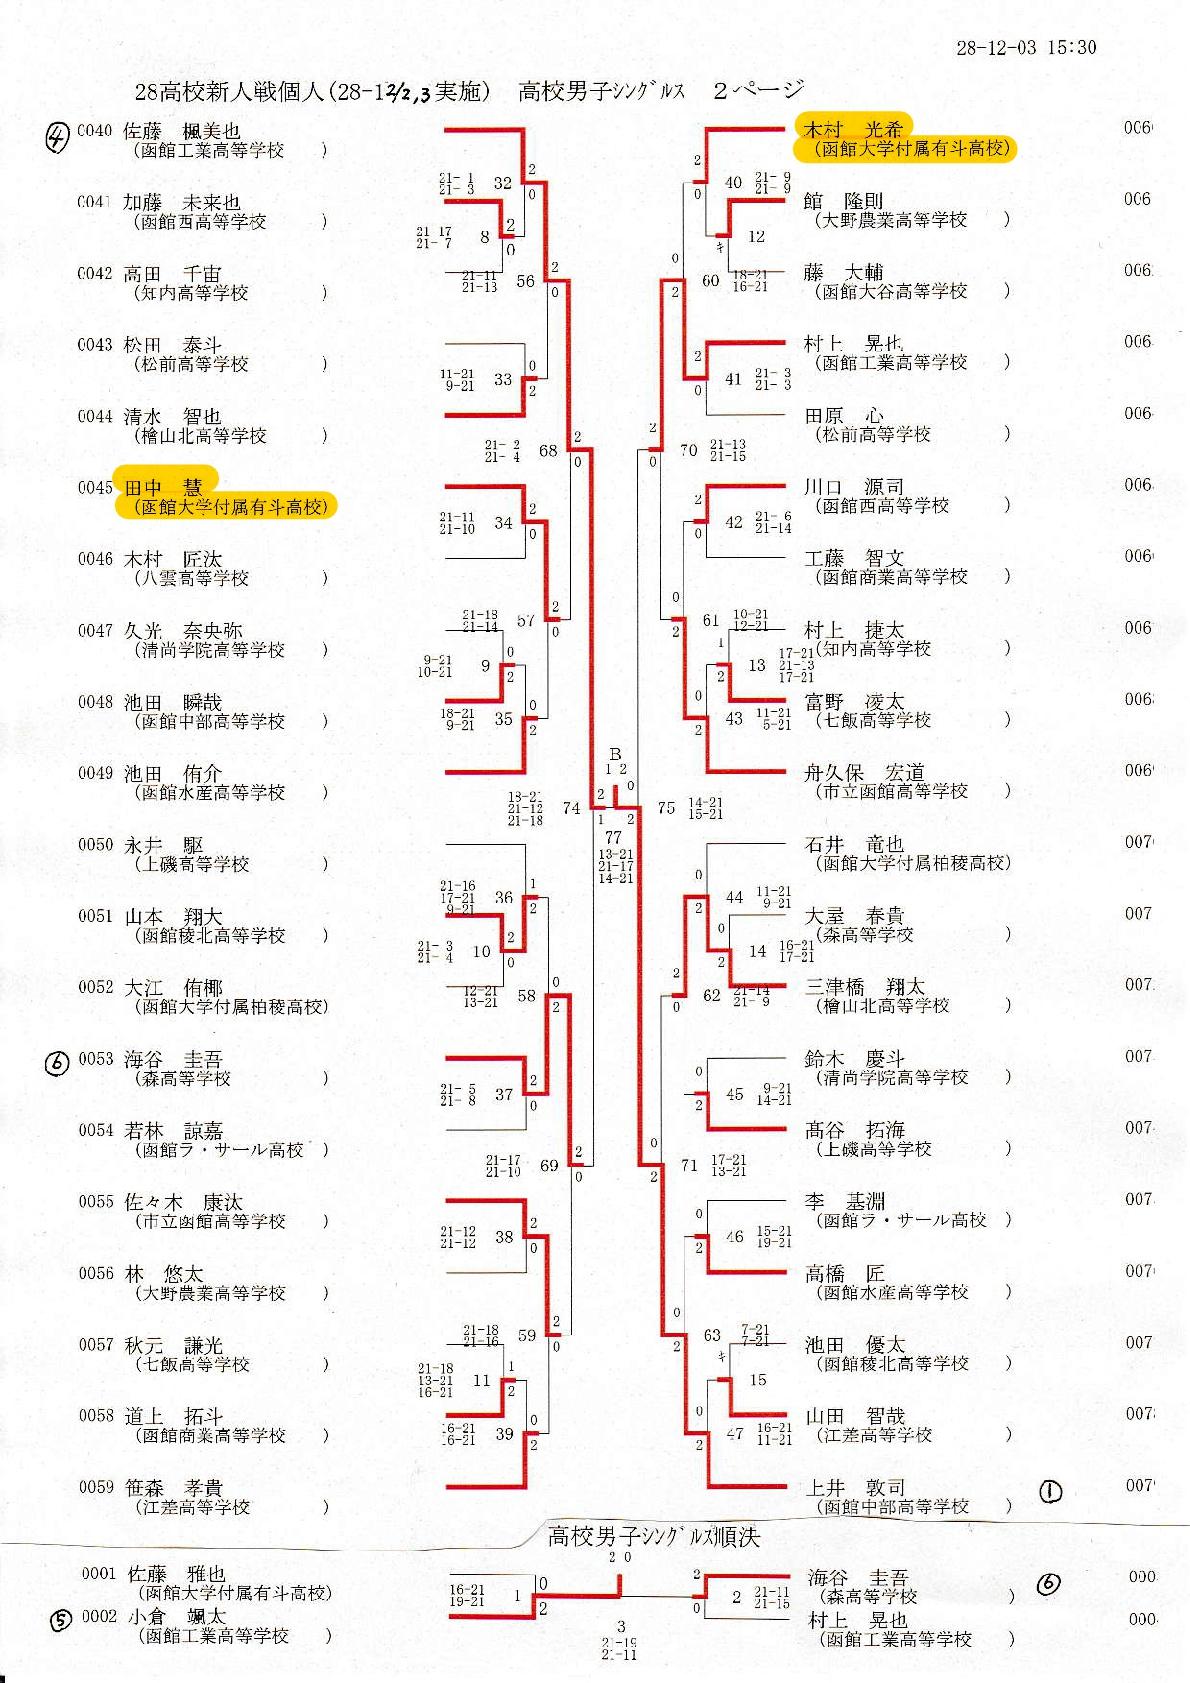 h28-koukou-sinzinsen-kekka-split-merge-007.jpg